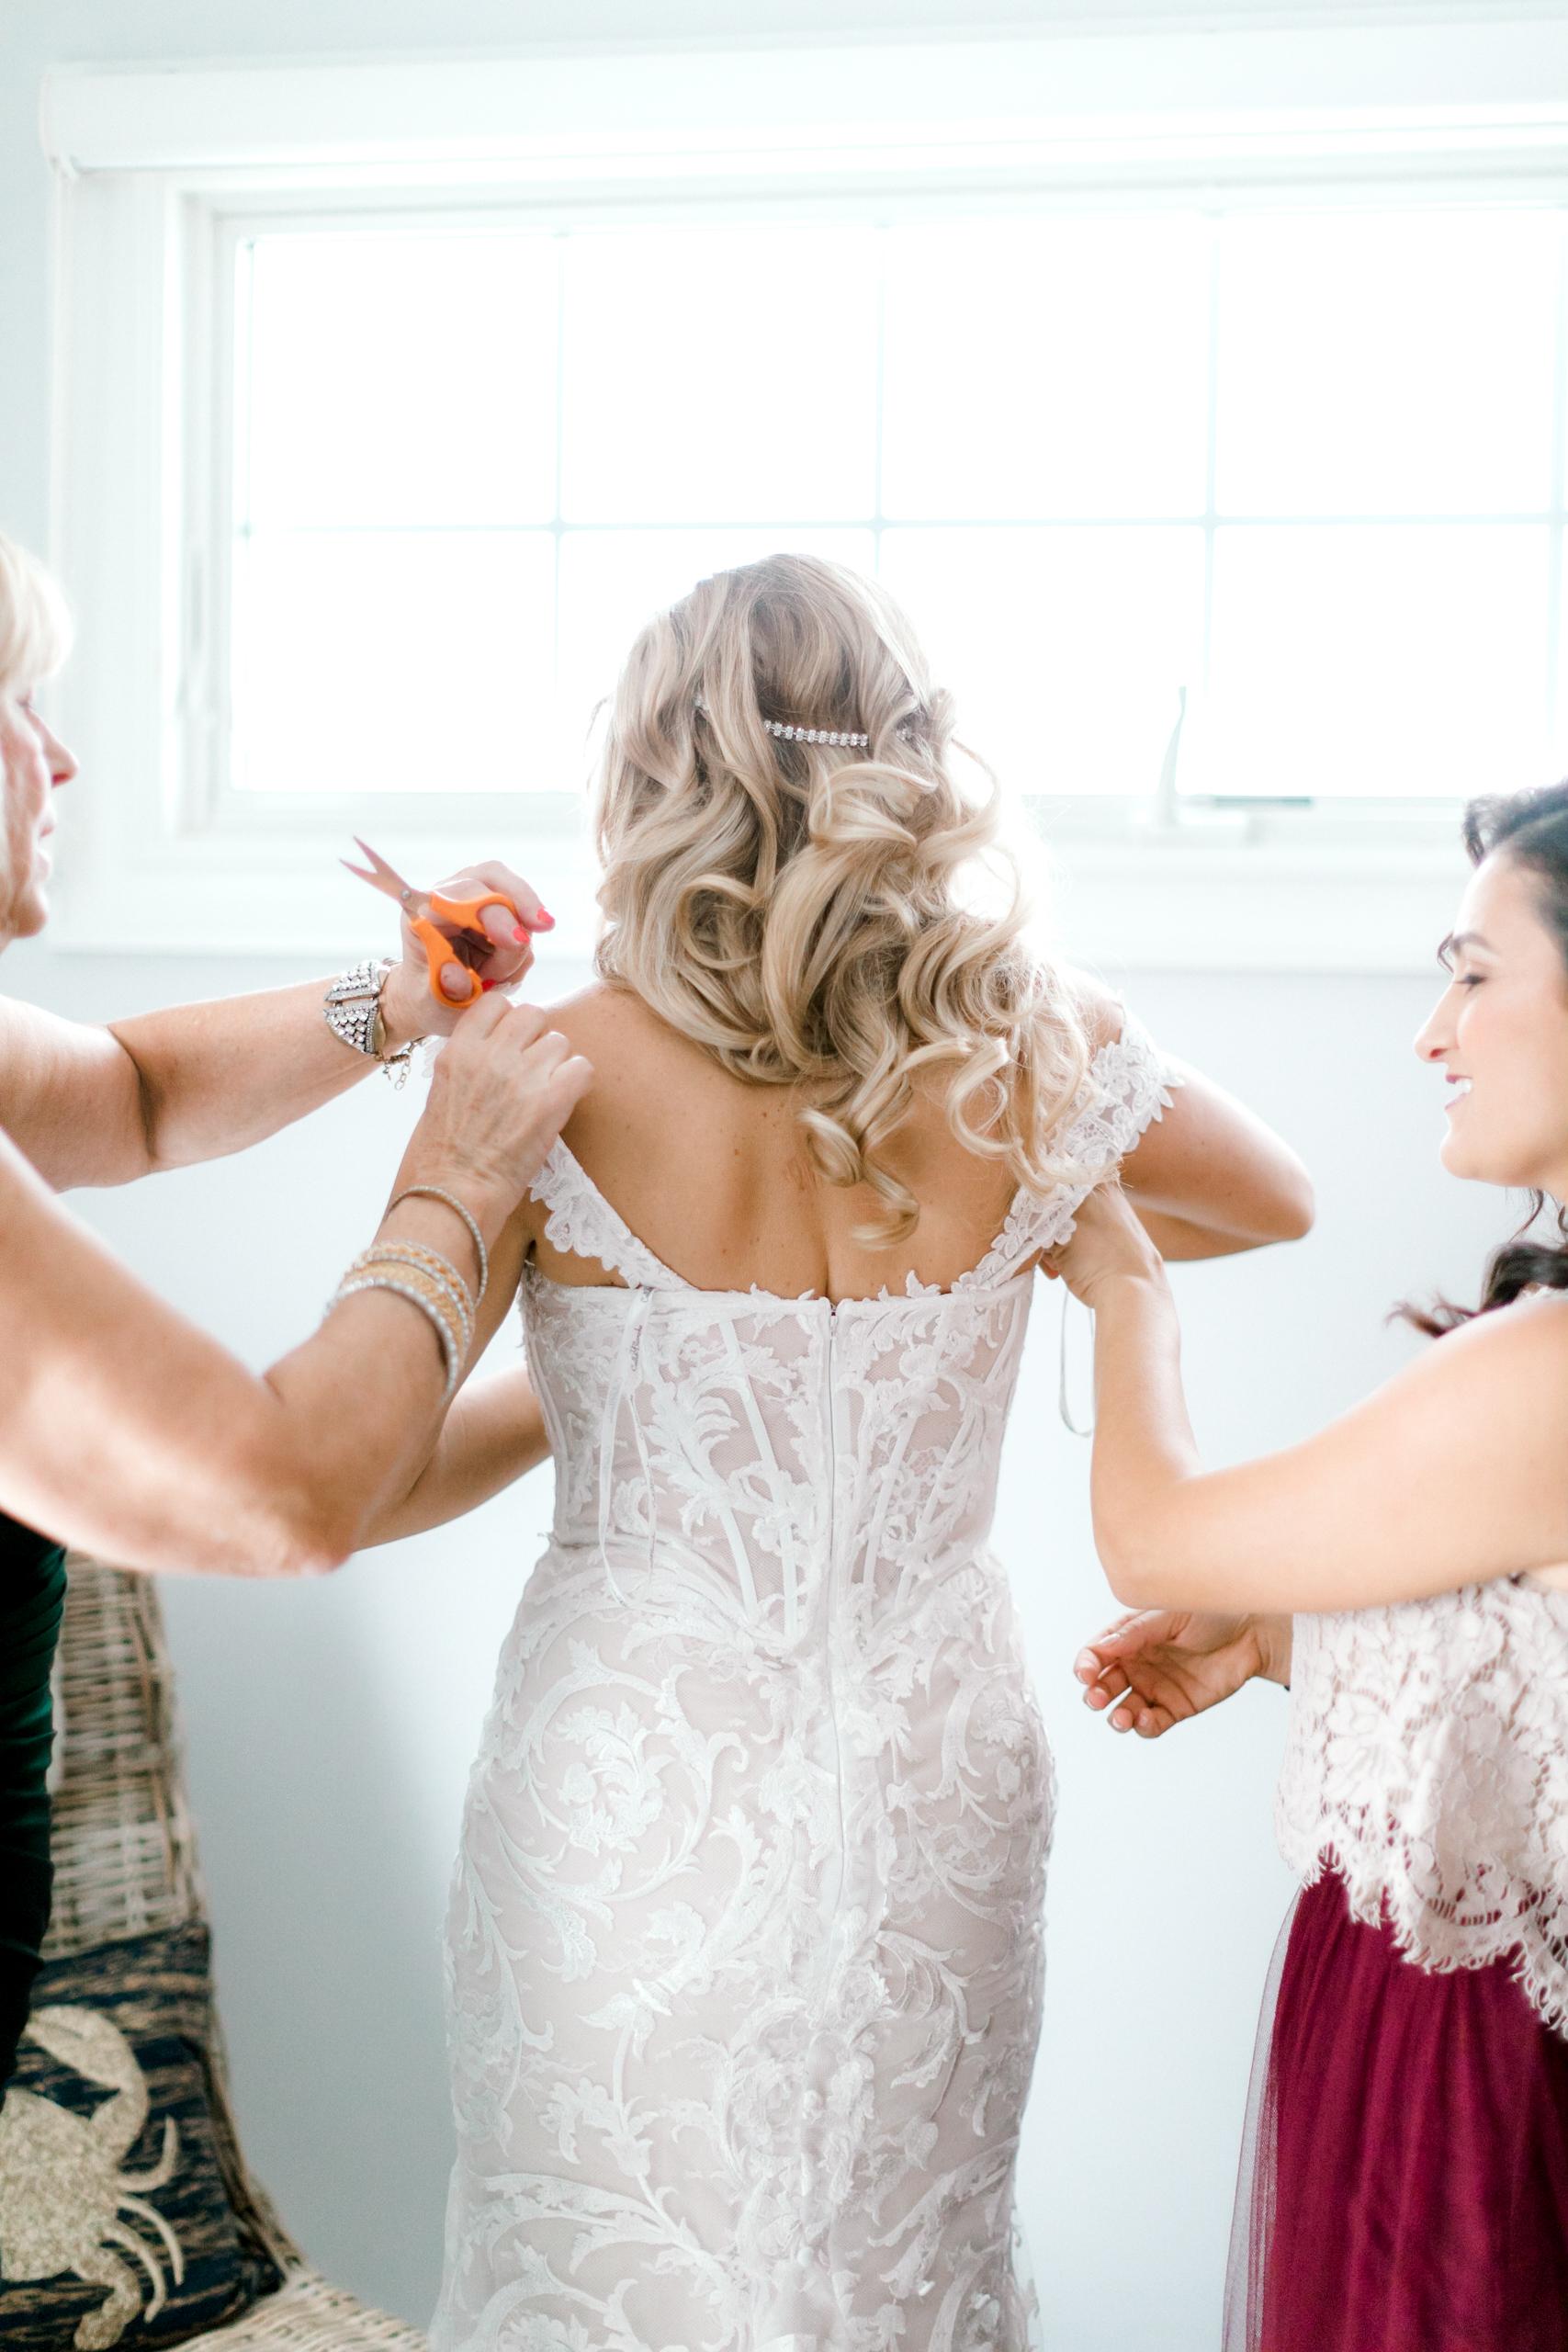 MagdalenaStudios_WeddingPhotographer_SeaIsleYachtClub-76.jpg